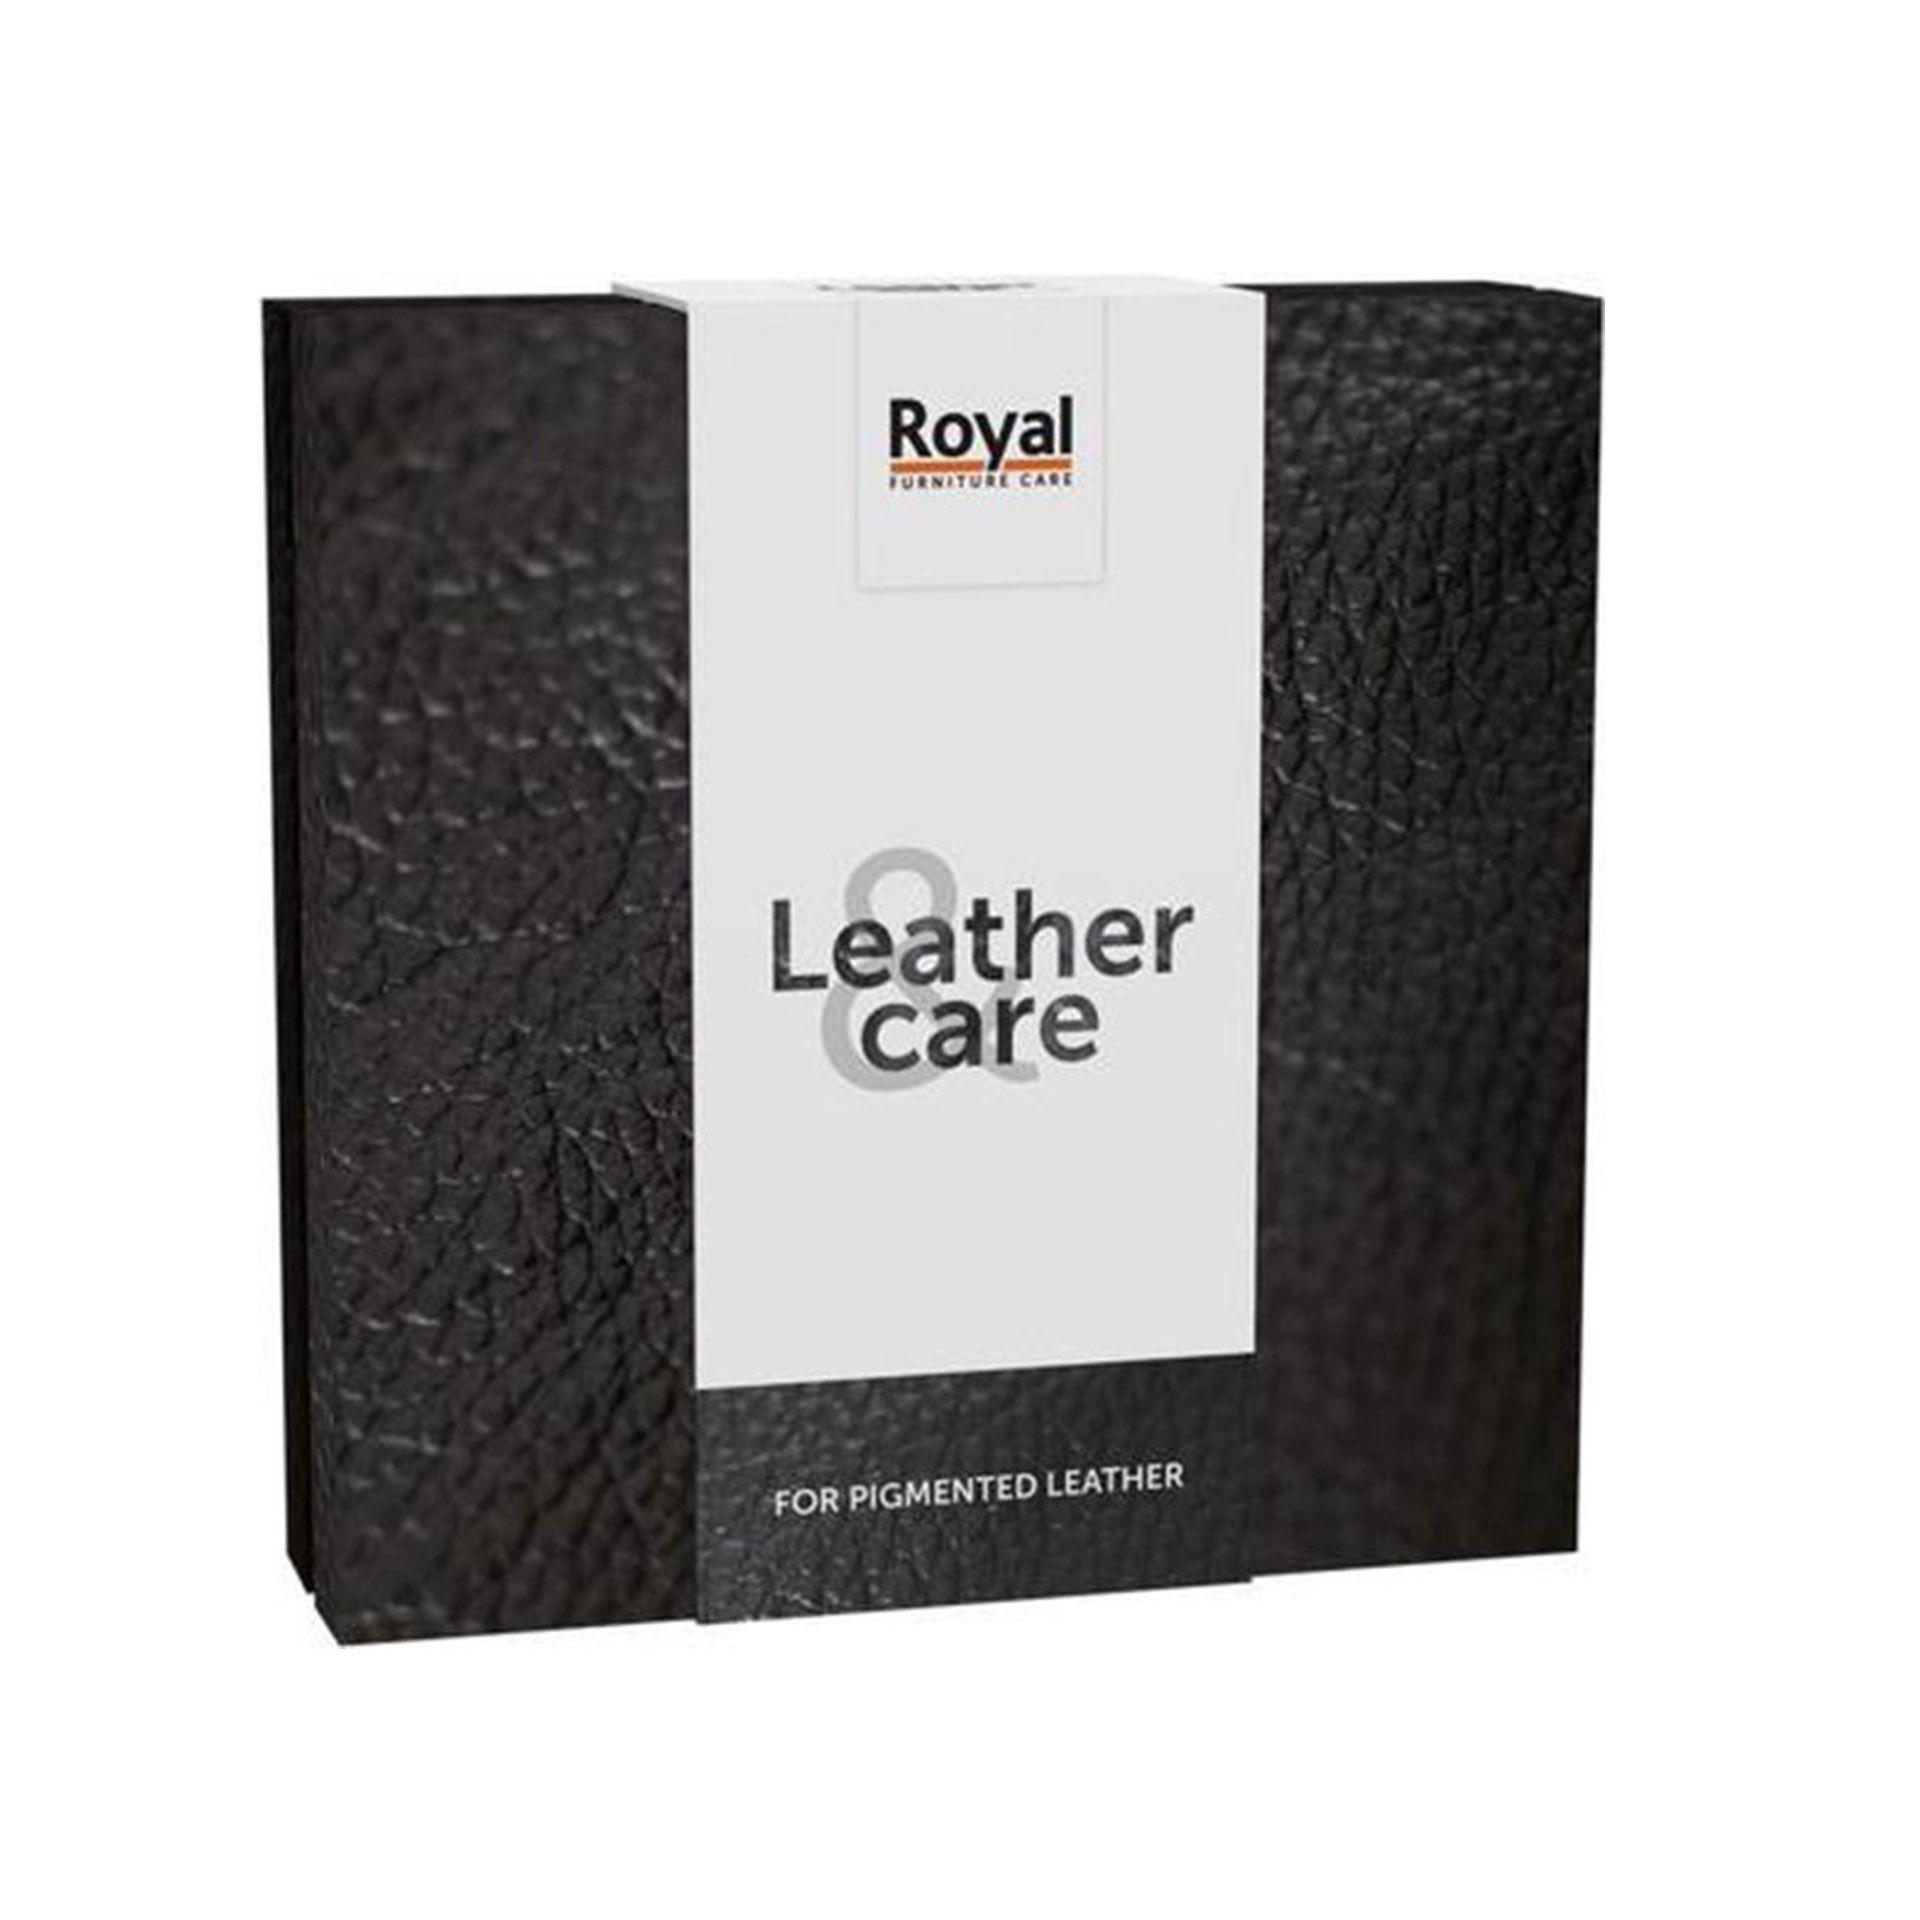 Premium Leather Care Kit - Care & Protect